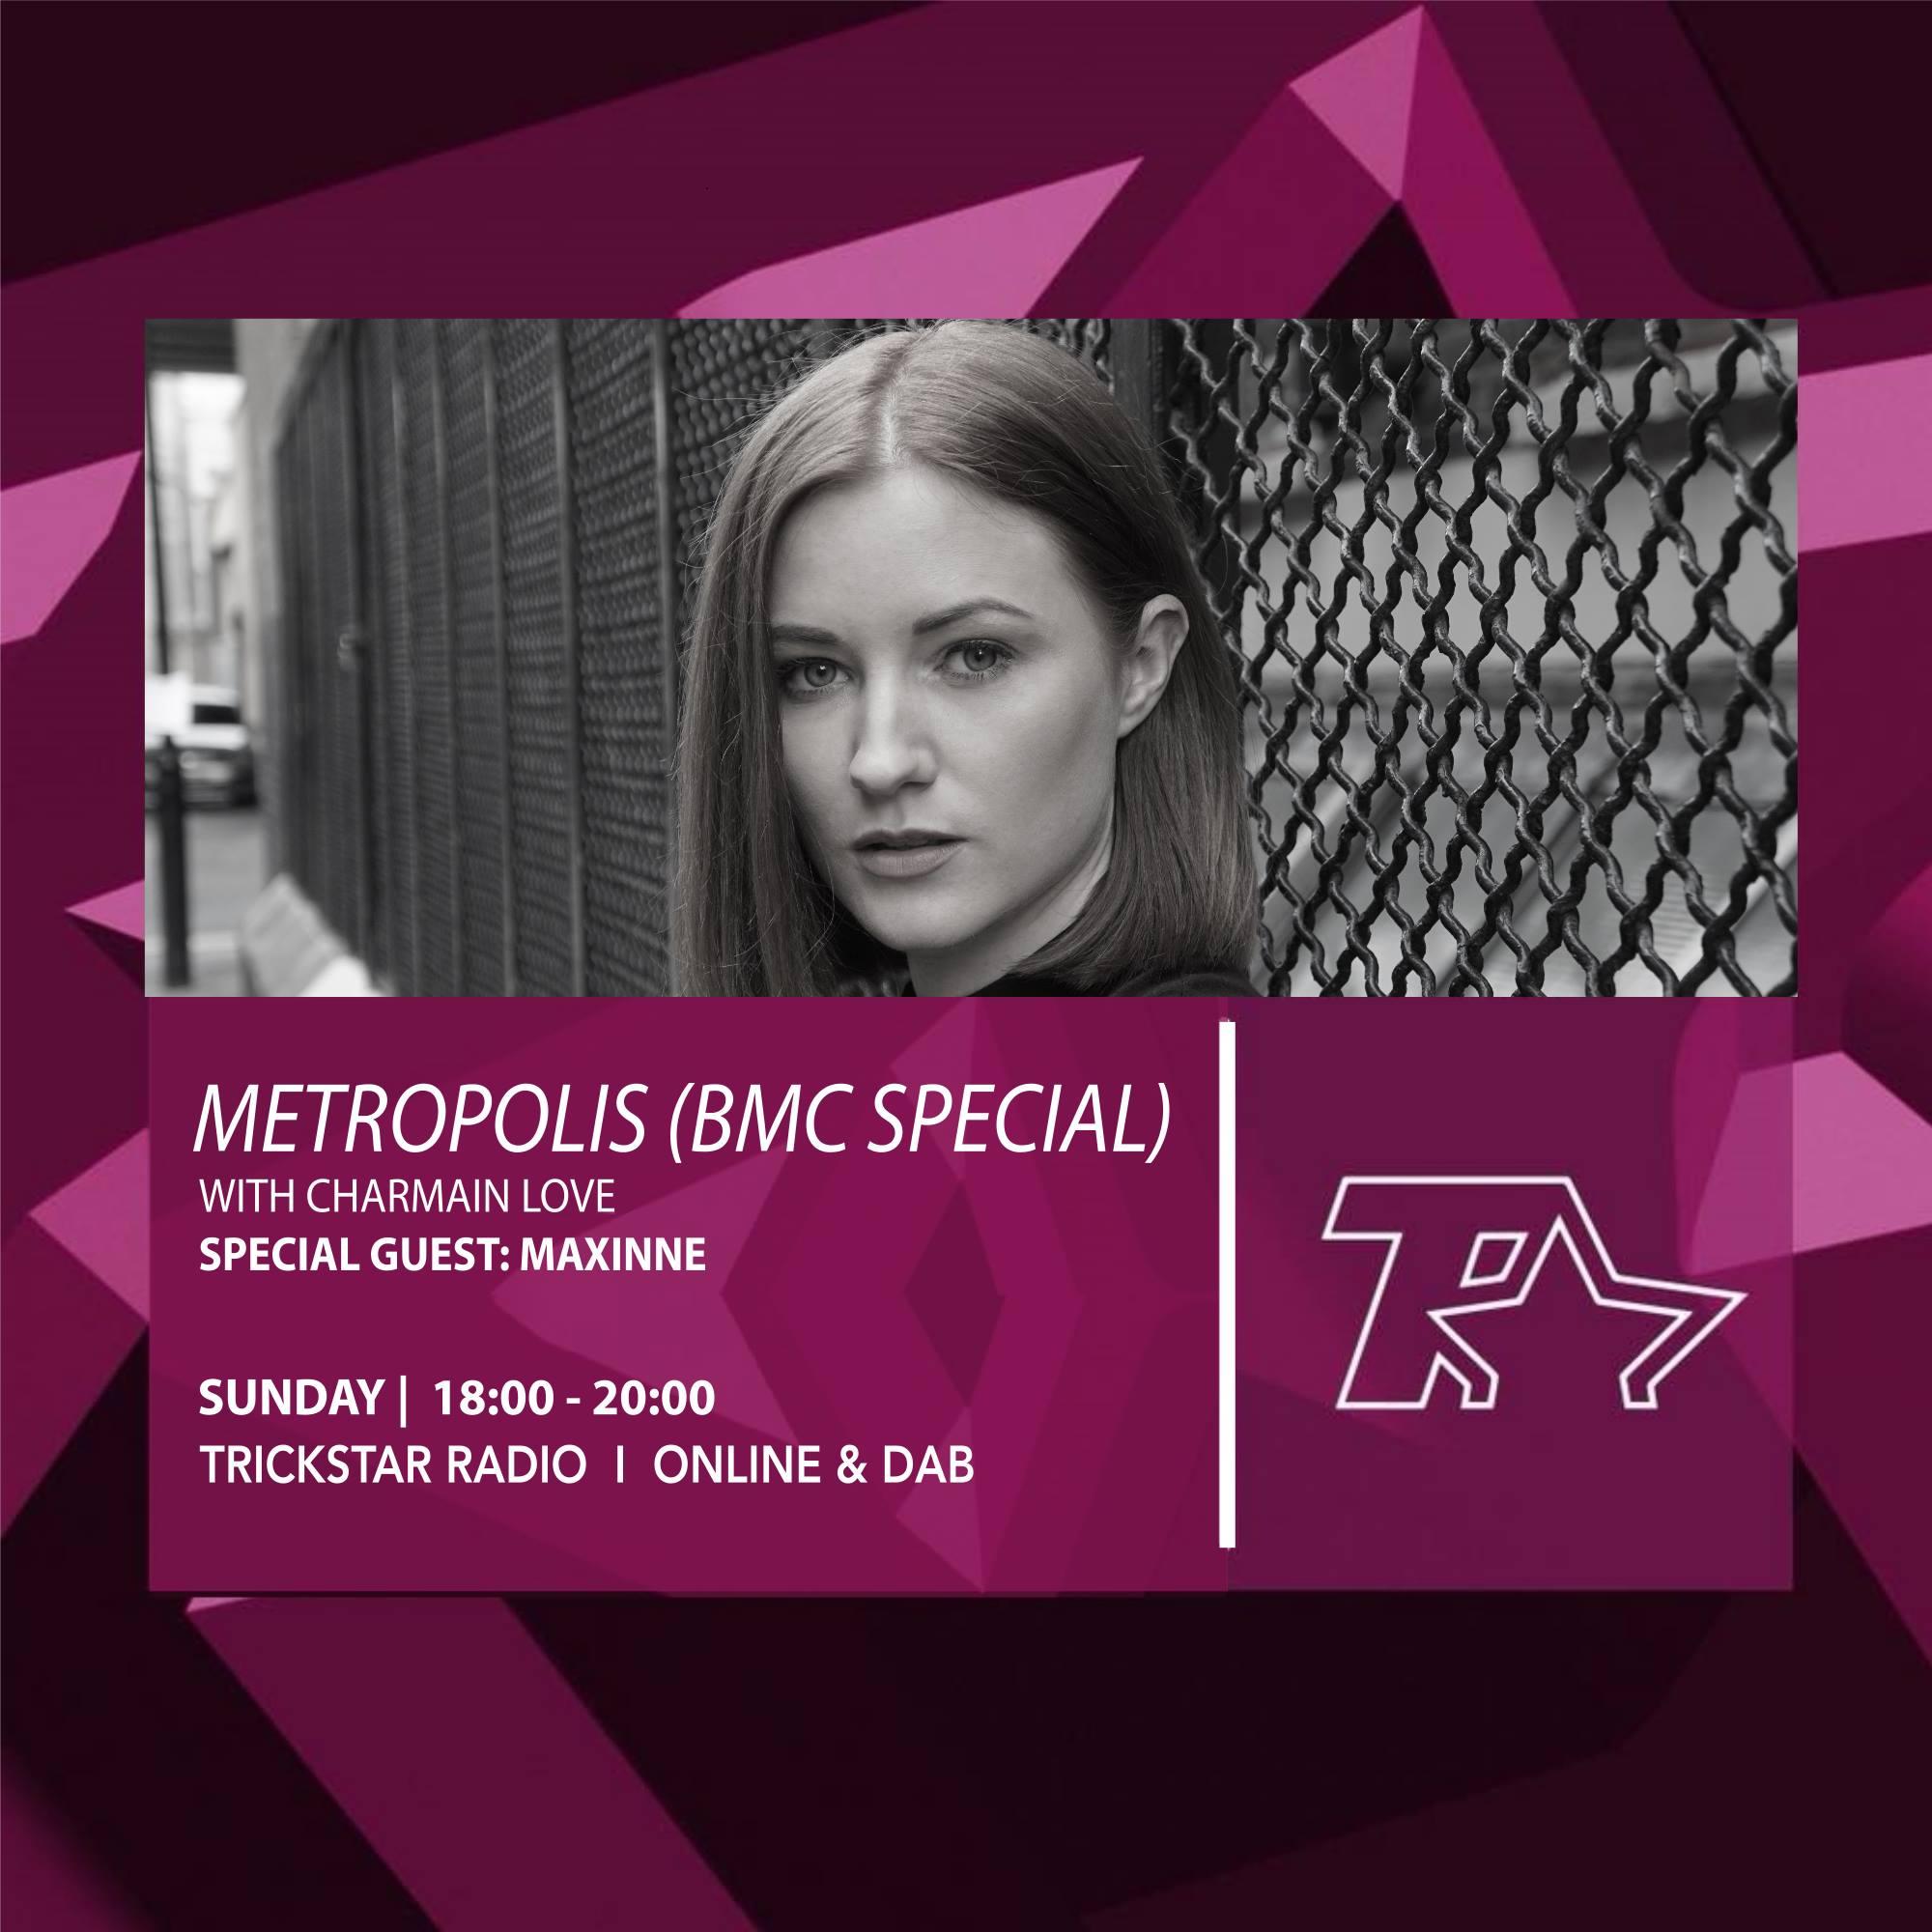 Metropolis - Guest Maxinne